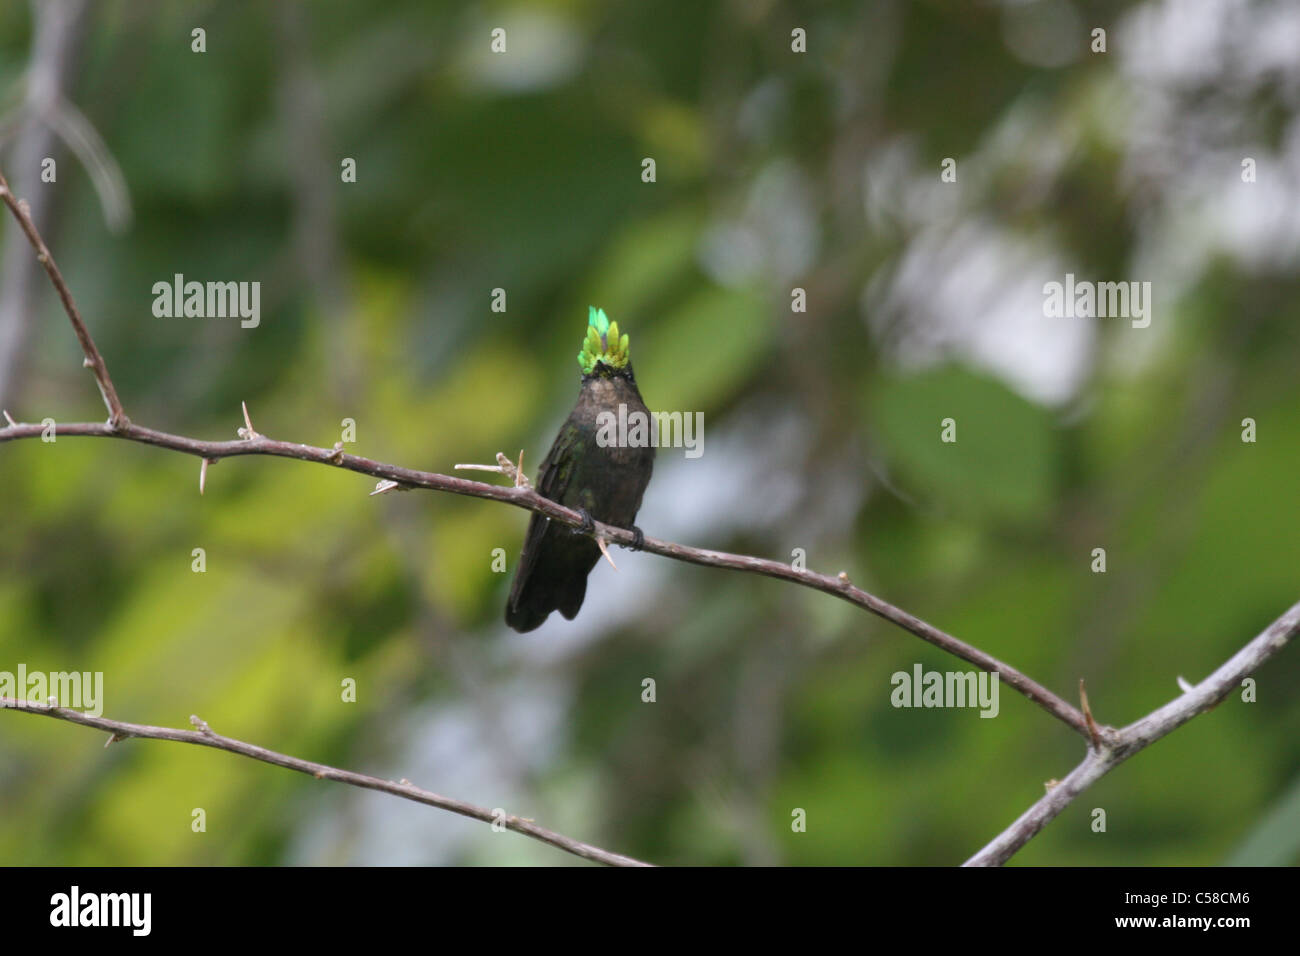 Antillean crested Humming Bird Photo Stock